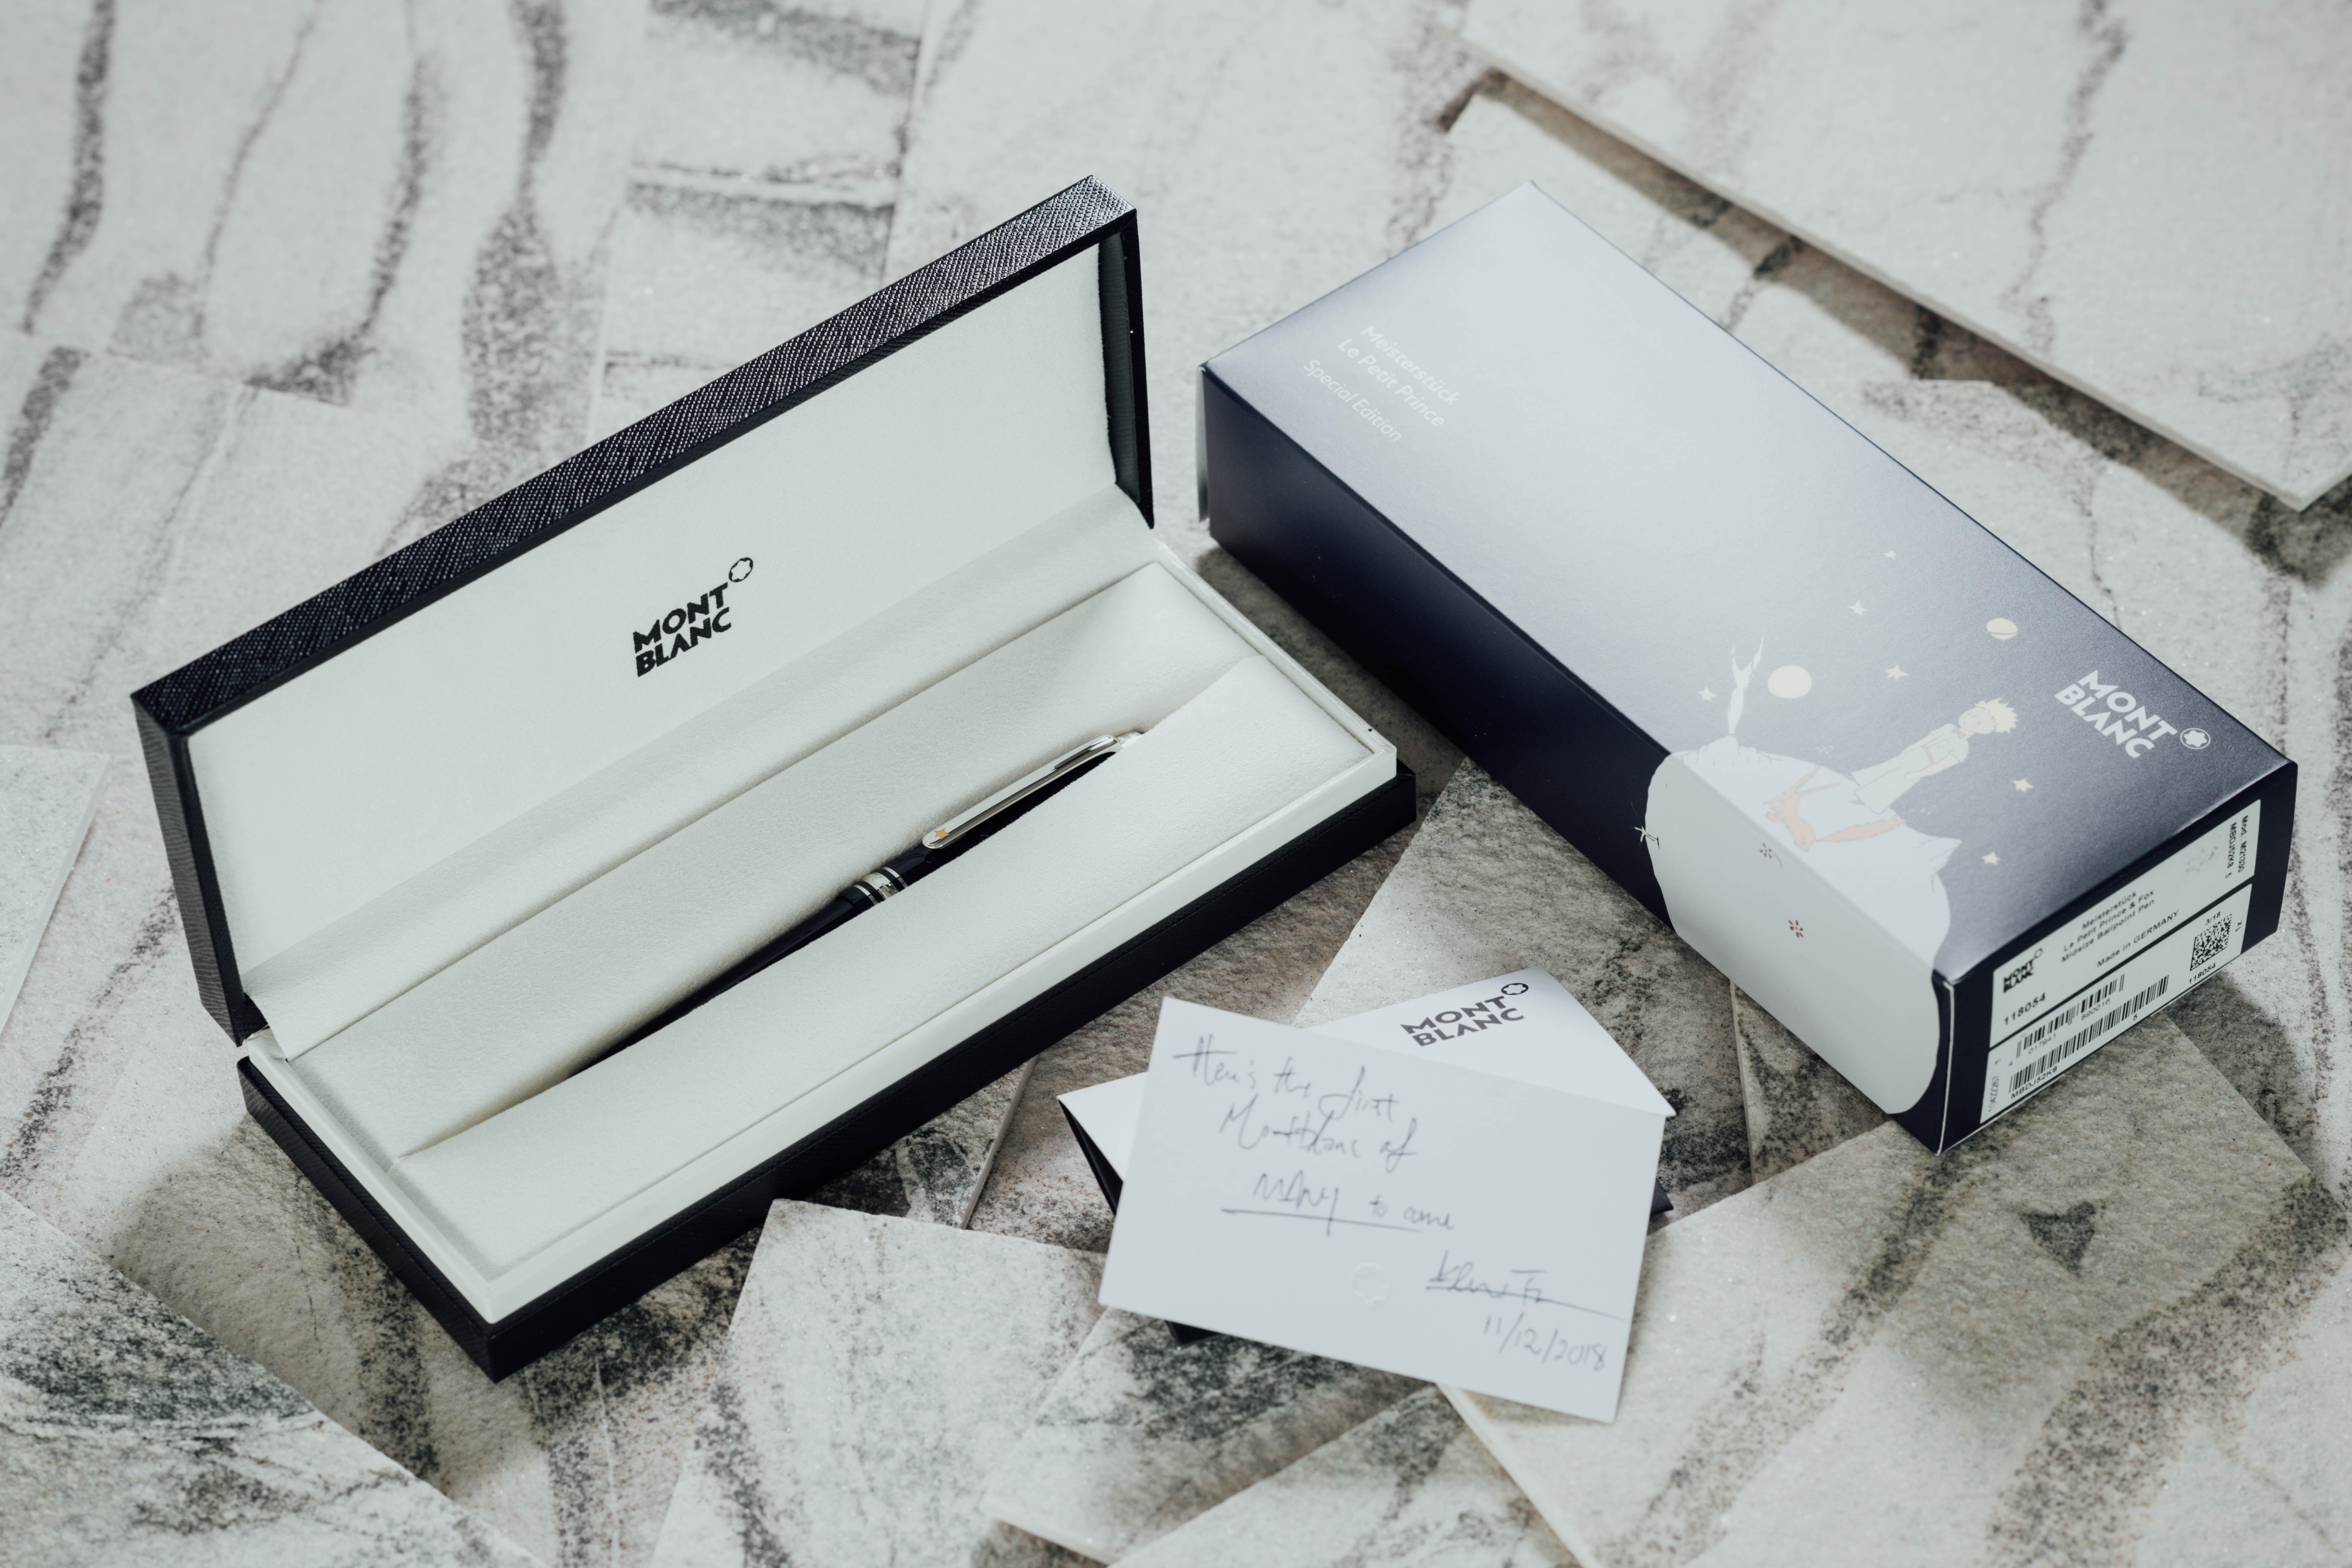 white and black HP printer